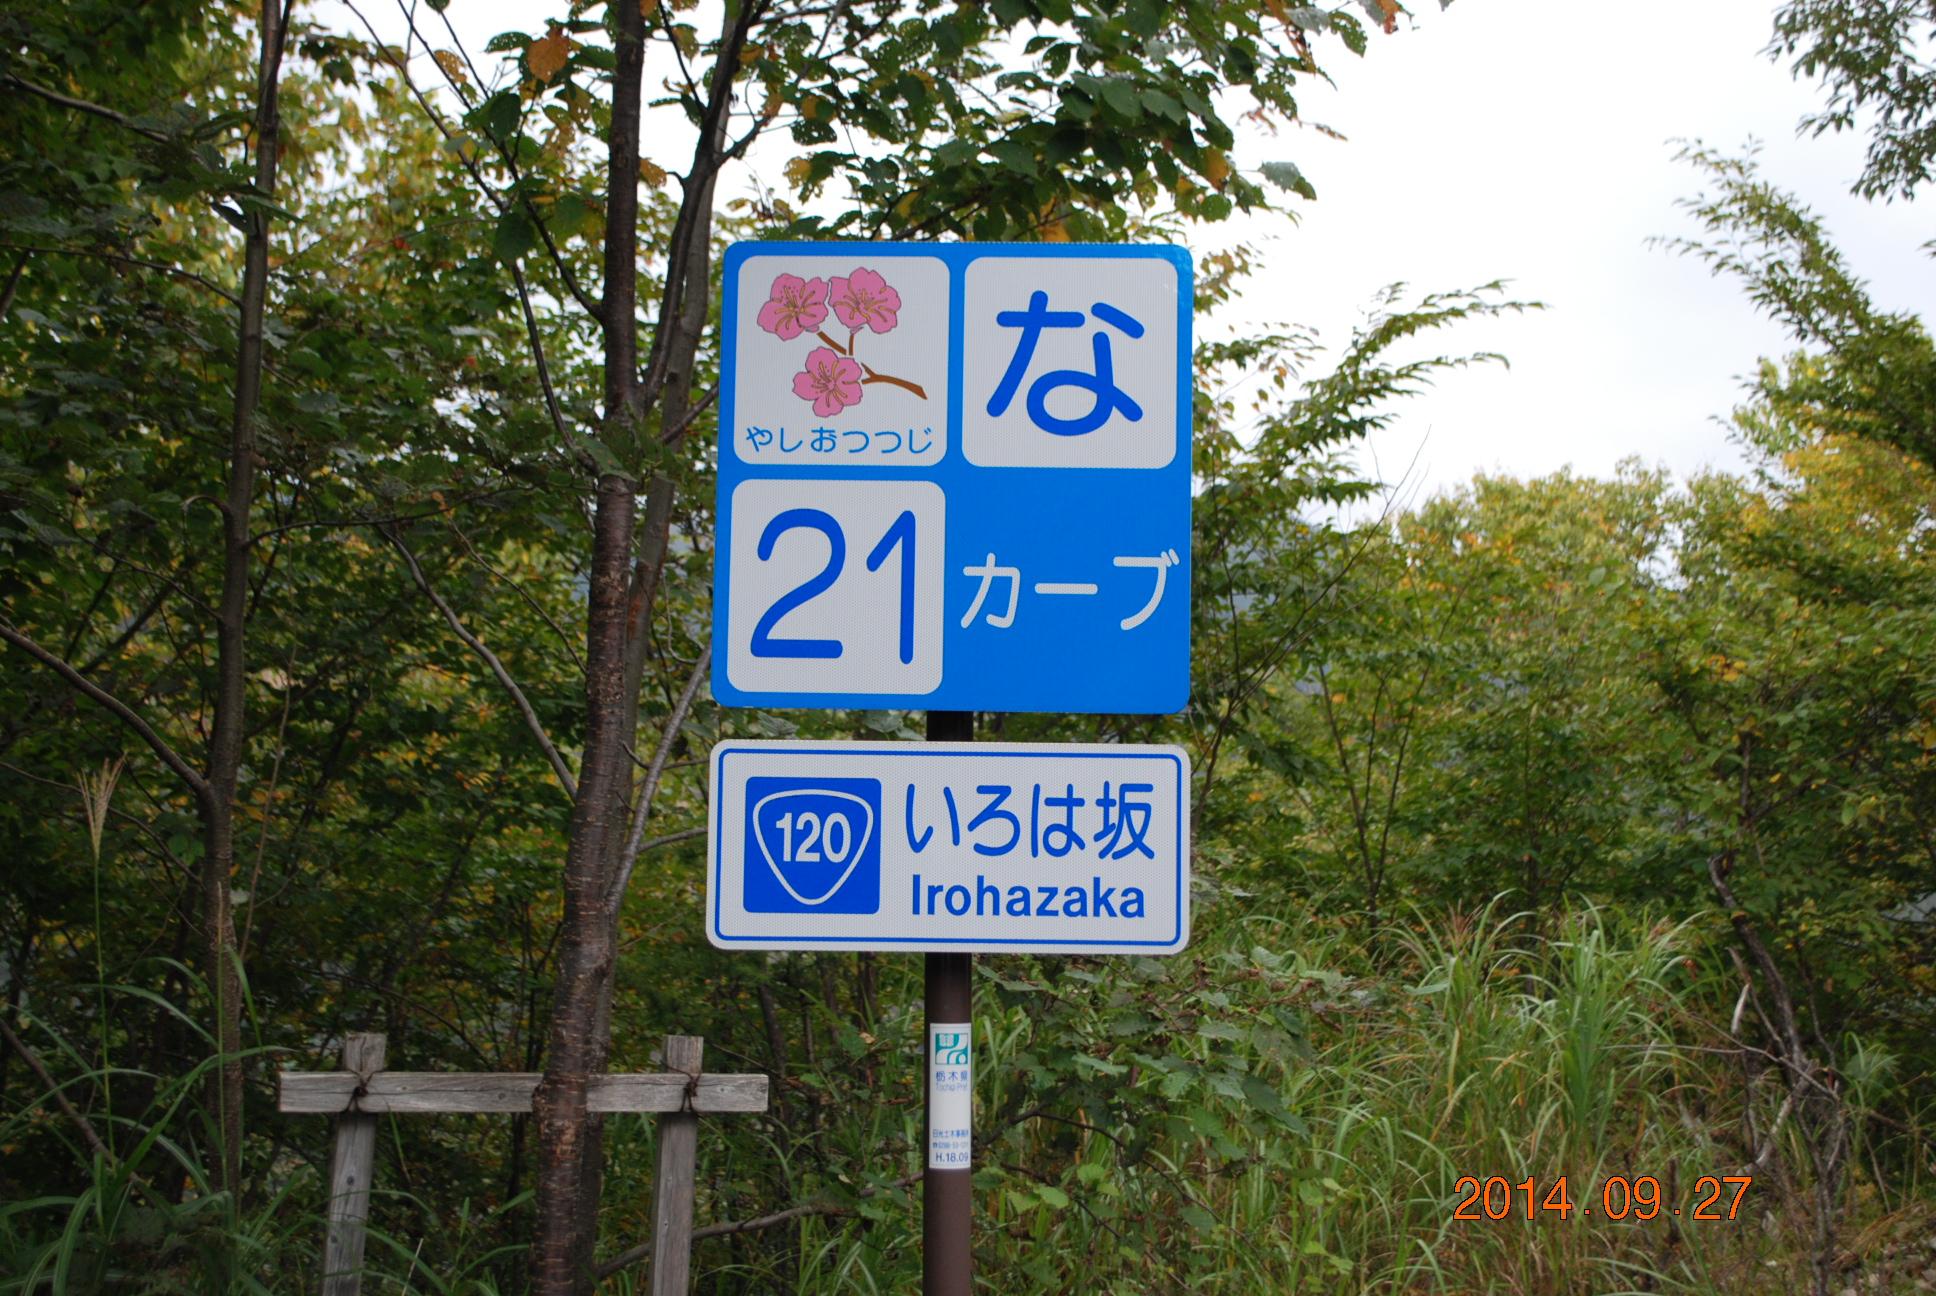 2014_0927_161307-DSC_3537.jpg